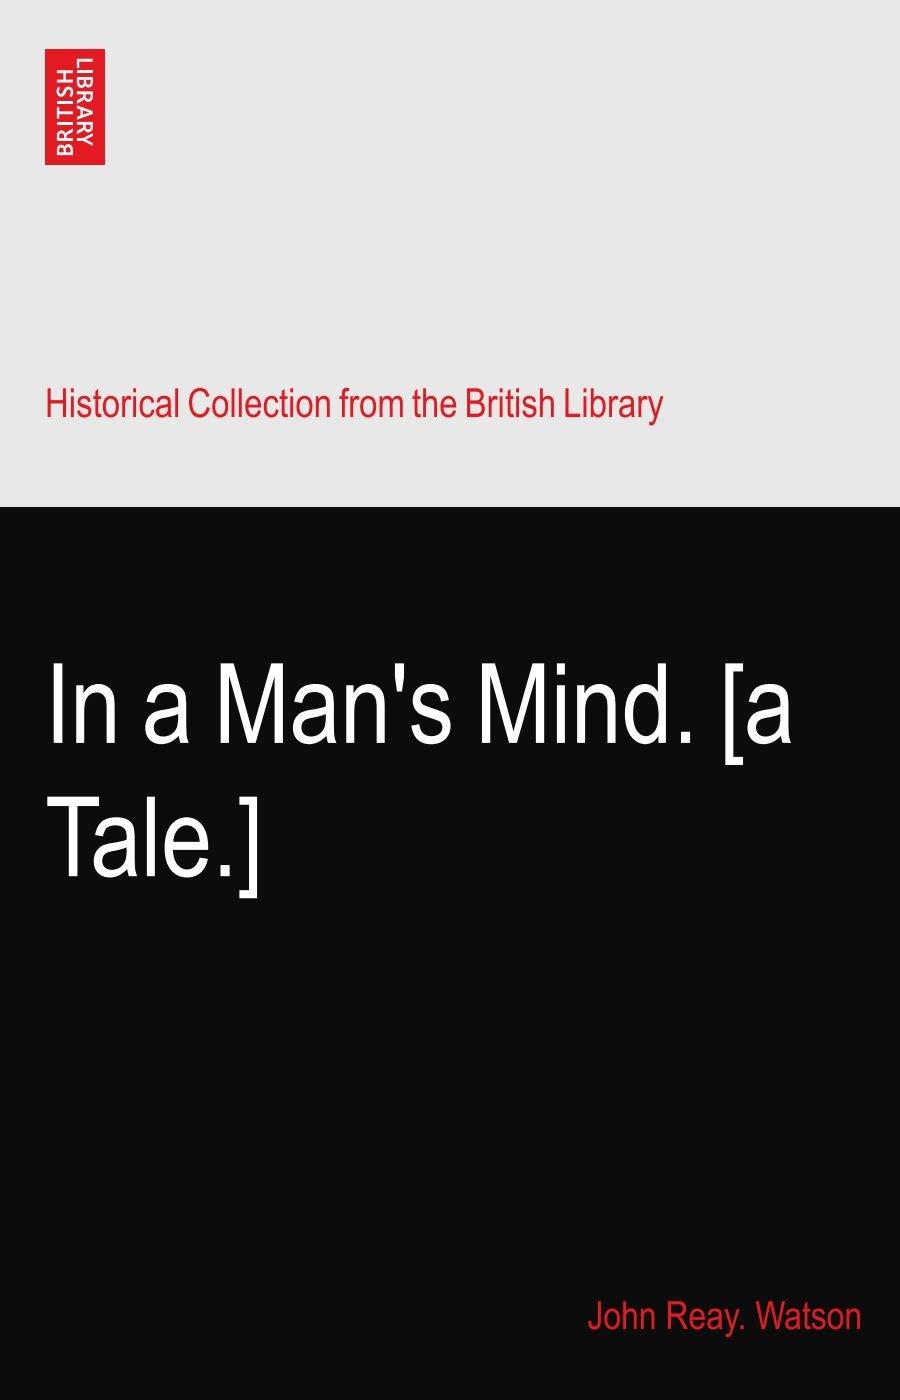 In a Man's Mind. [a Tale.] PDF